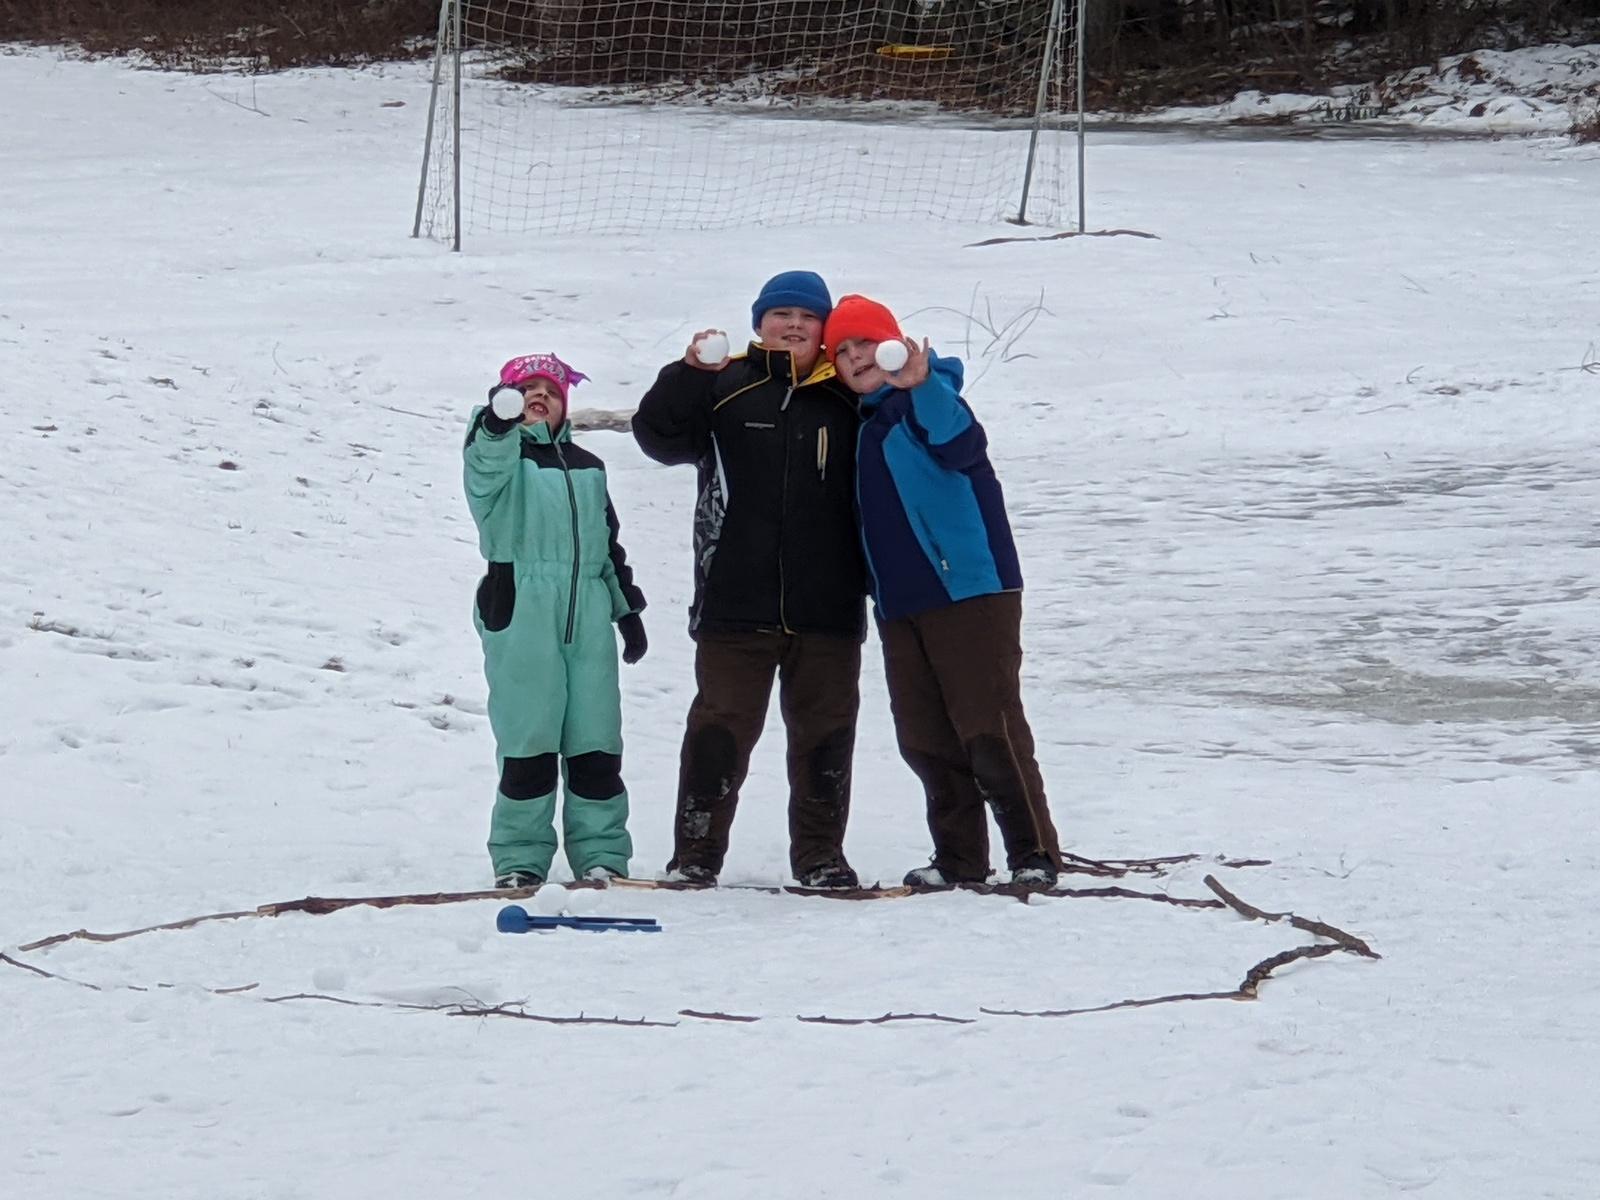 4th Grade Village School 2 Week 2 Winter Games 2021 Moment of the Week